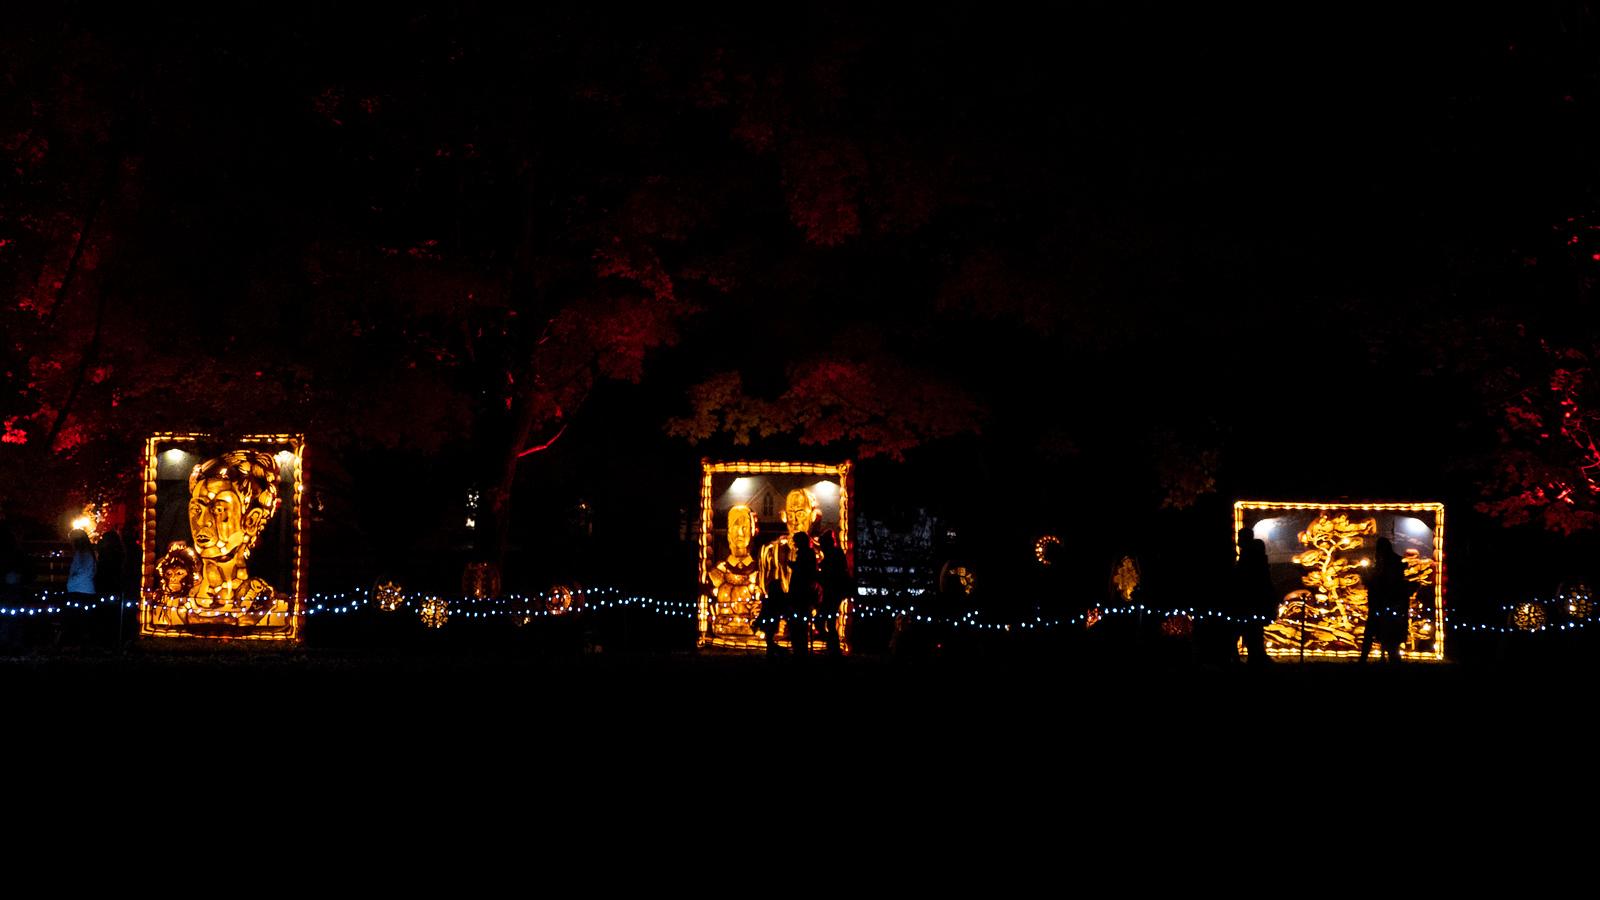 Pumpkinferno: Pumpkin Lantern Festival at Upper Canada Village, Ontario